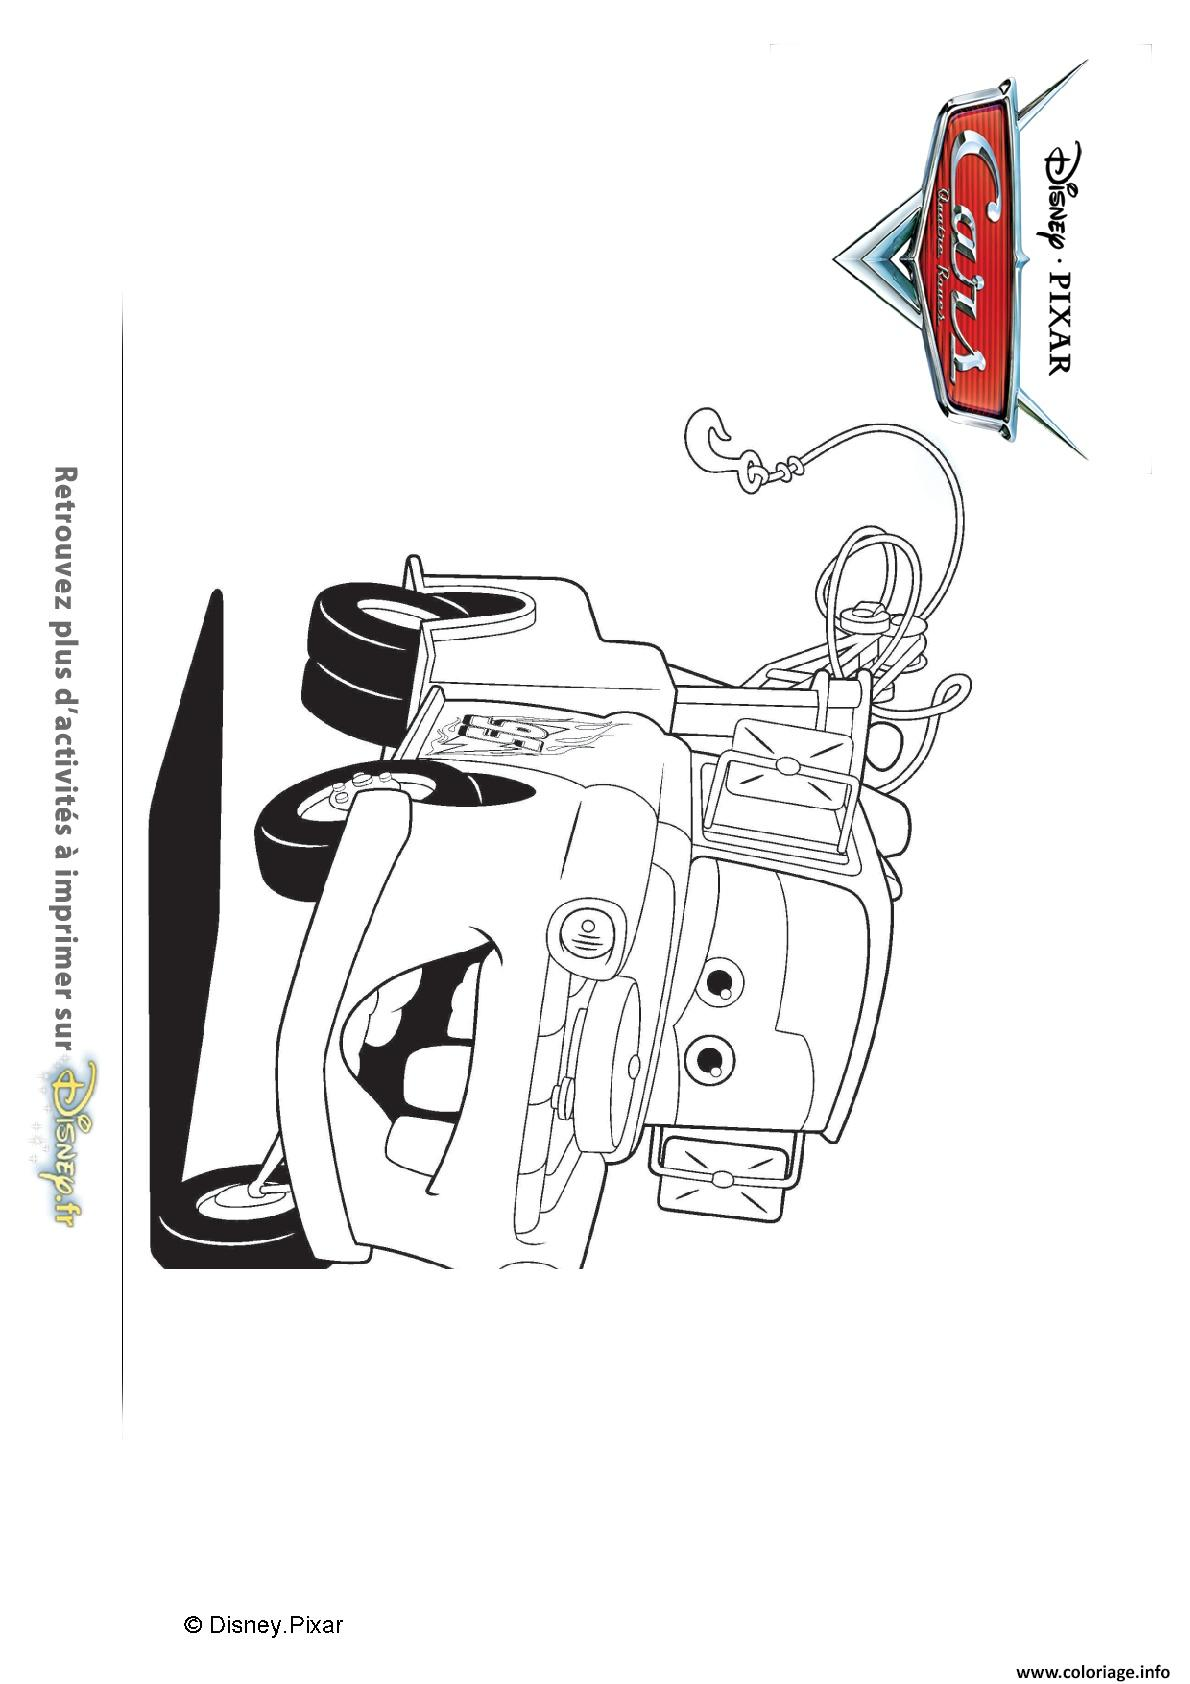 Coloriage martin fidele depanneuse rouillee cars disney dessin - Coloriage martin ...